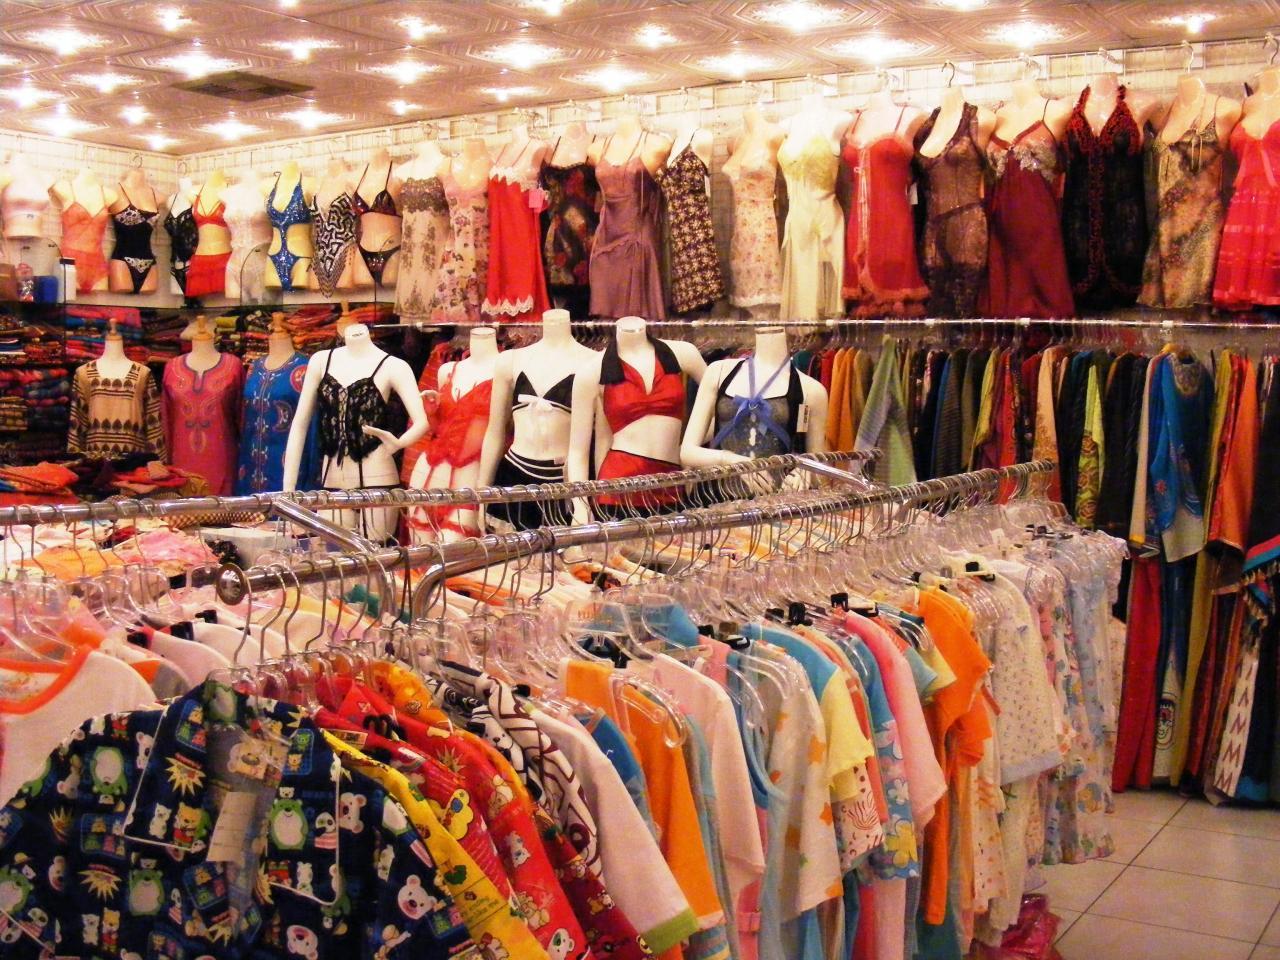 بالصور محلات ملابس , تعرف على احدث موديلات ملابس بالمحلات 1939 13